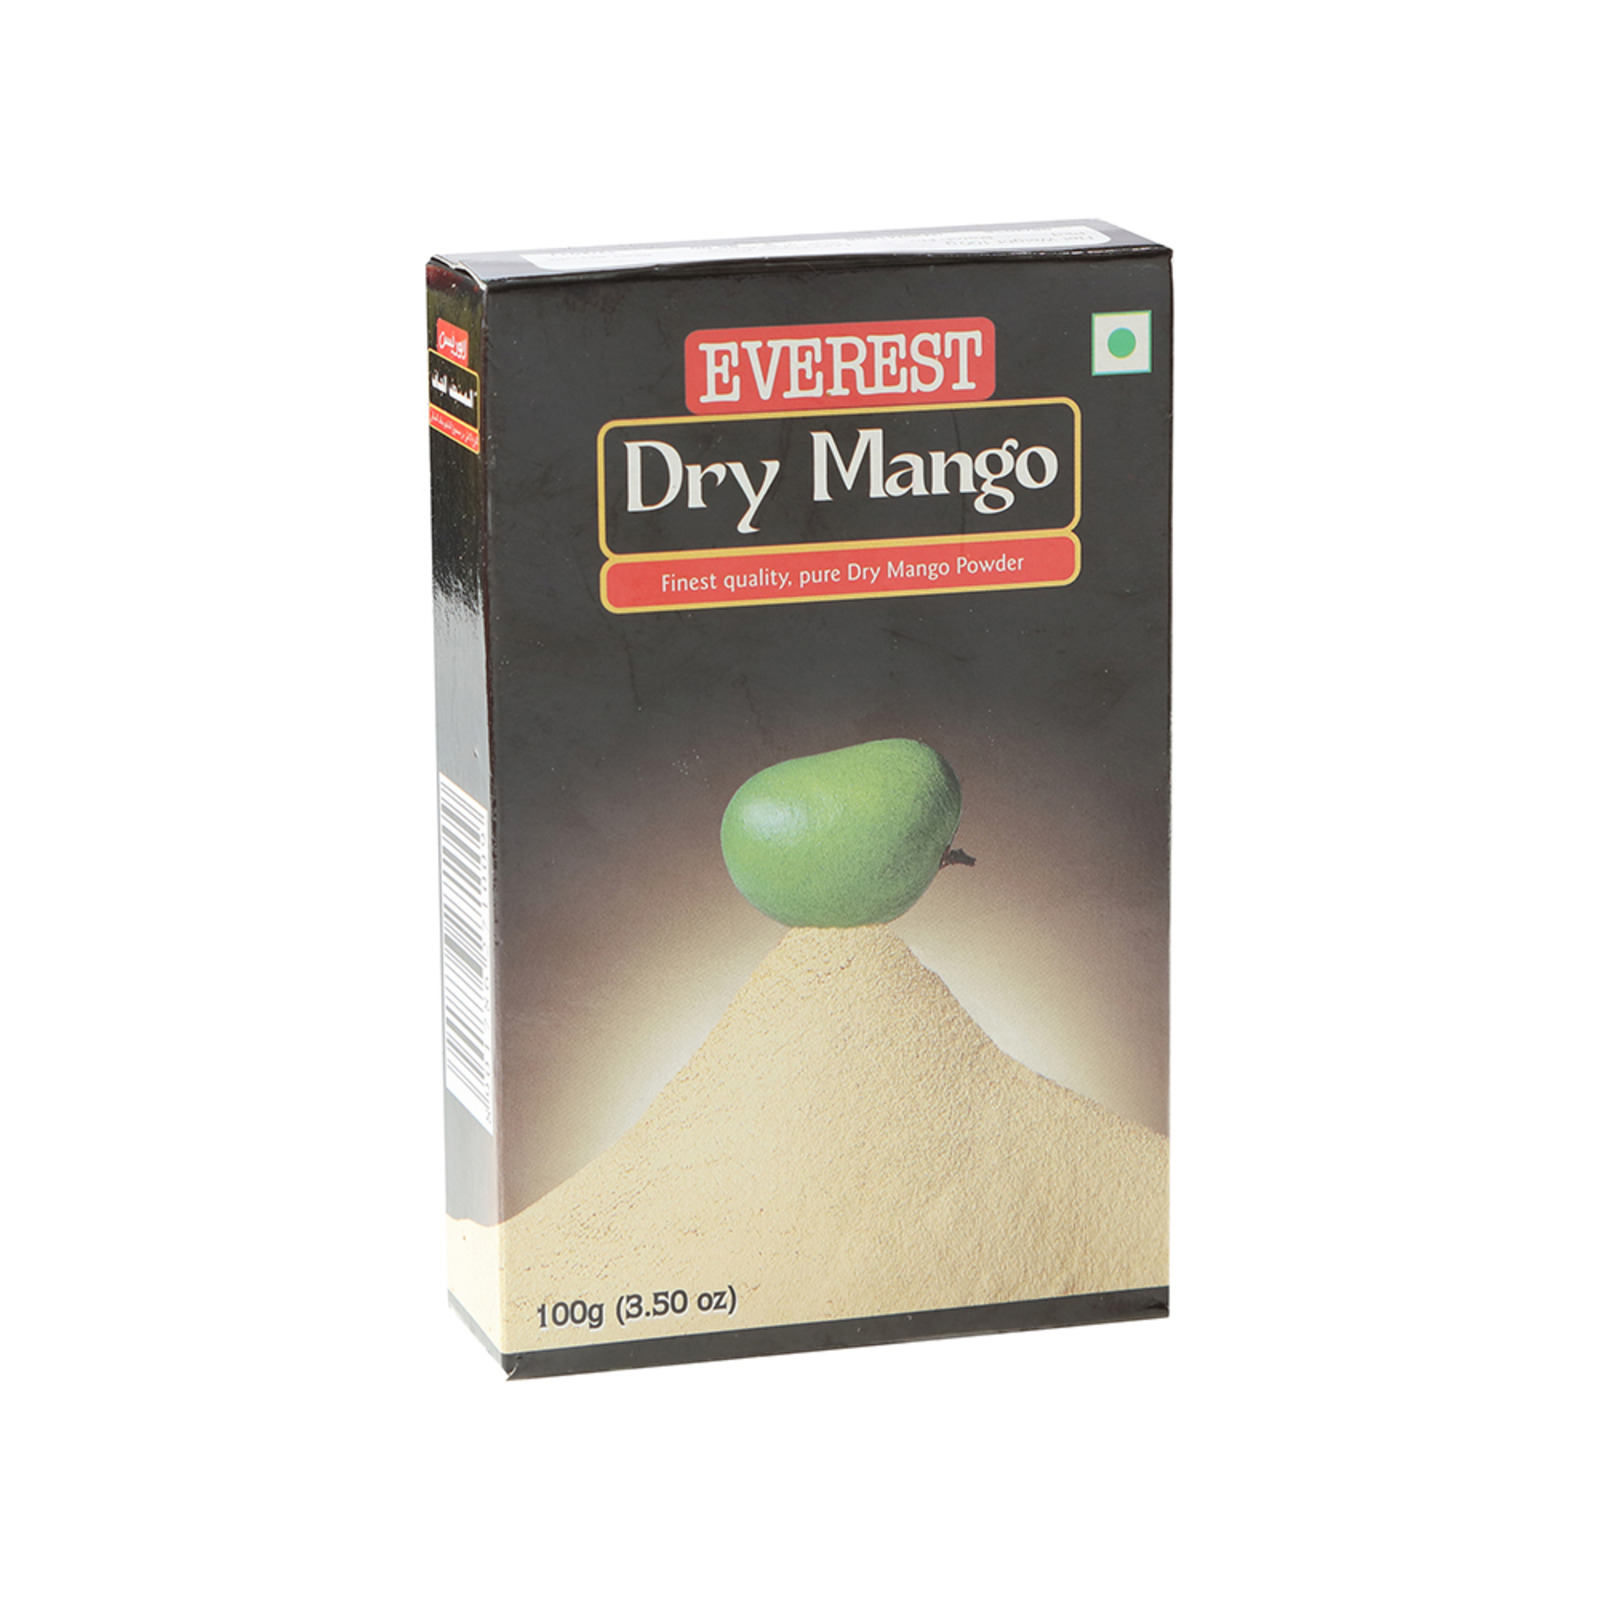 Everest - Dry Mango